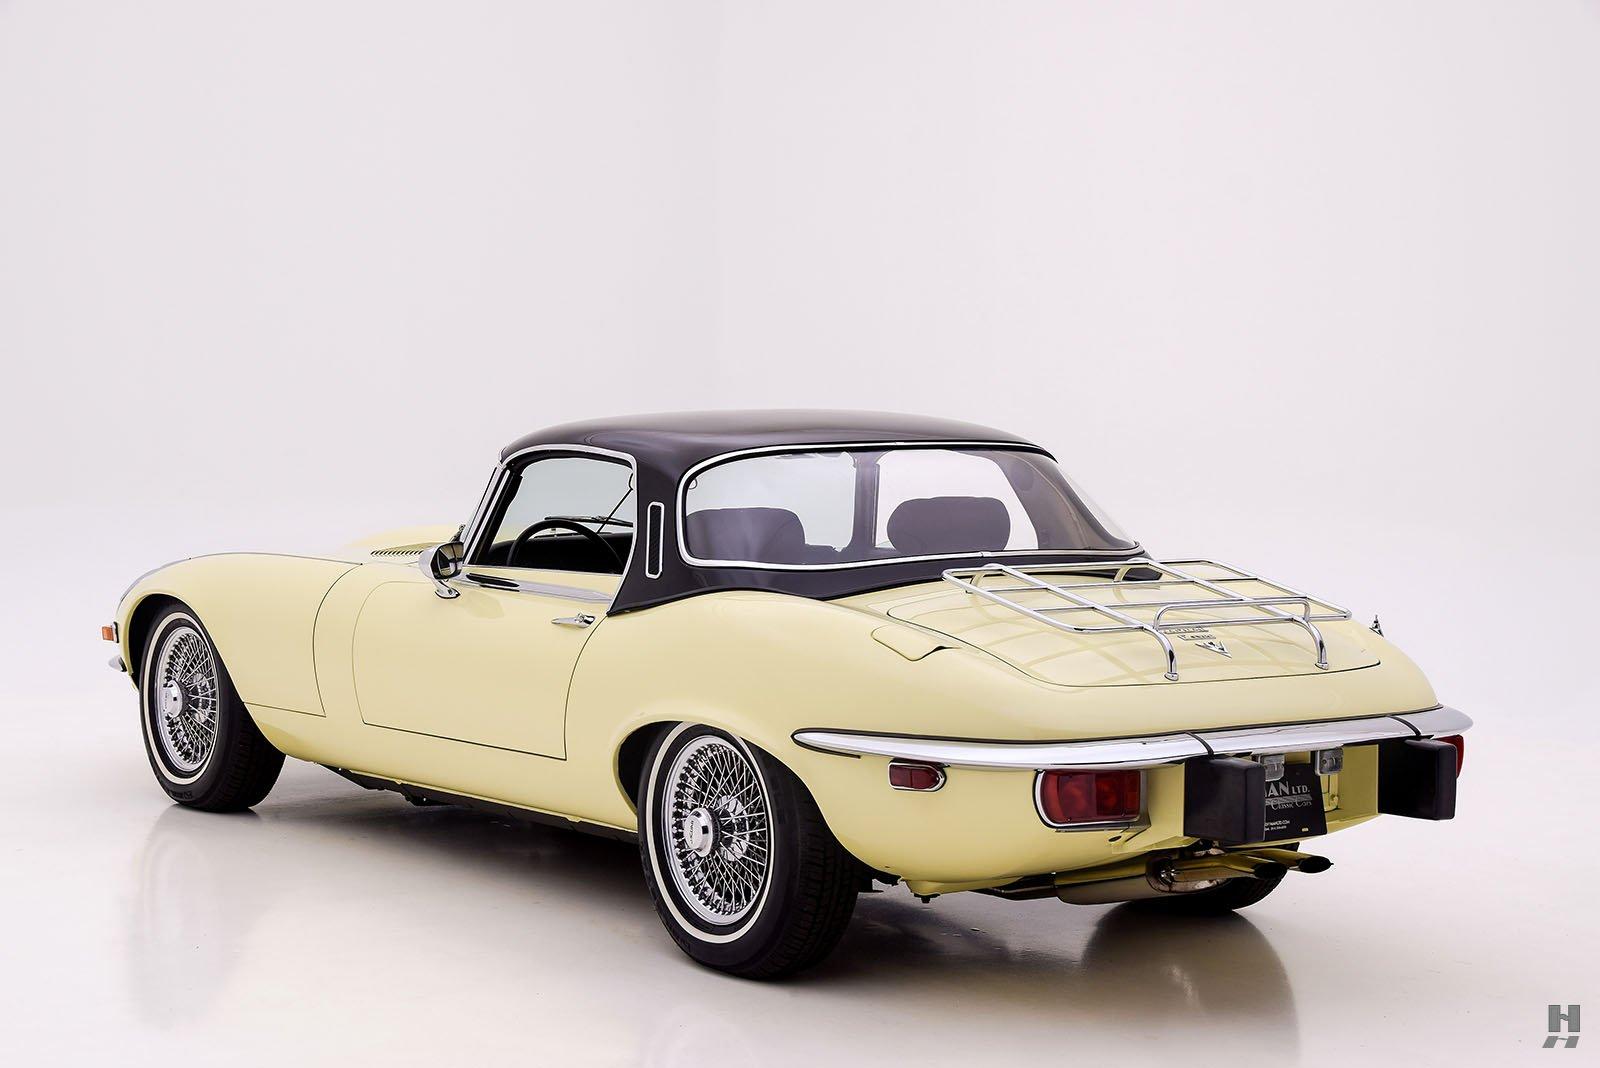 1974 Jaguar E-Type Roadster For Sale   Buy Classic Jaguar ...